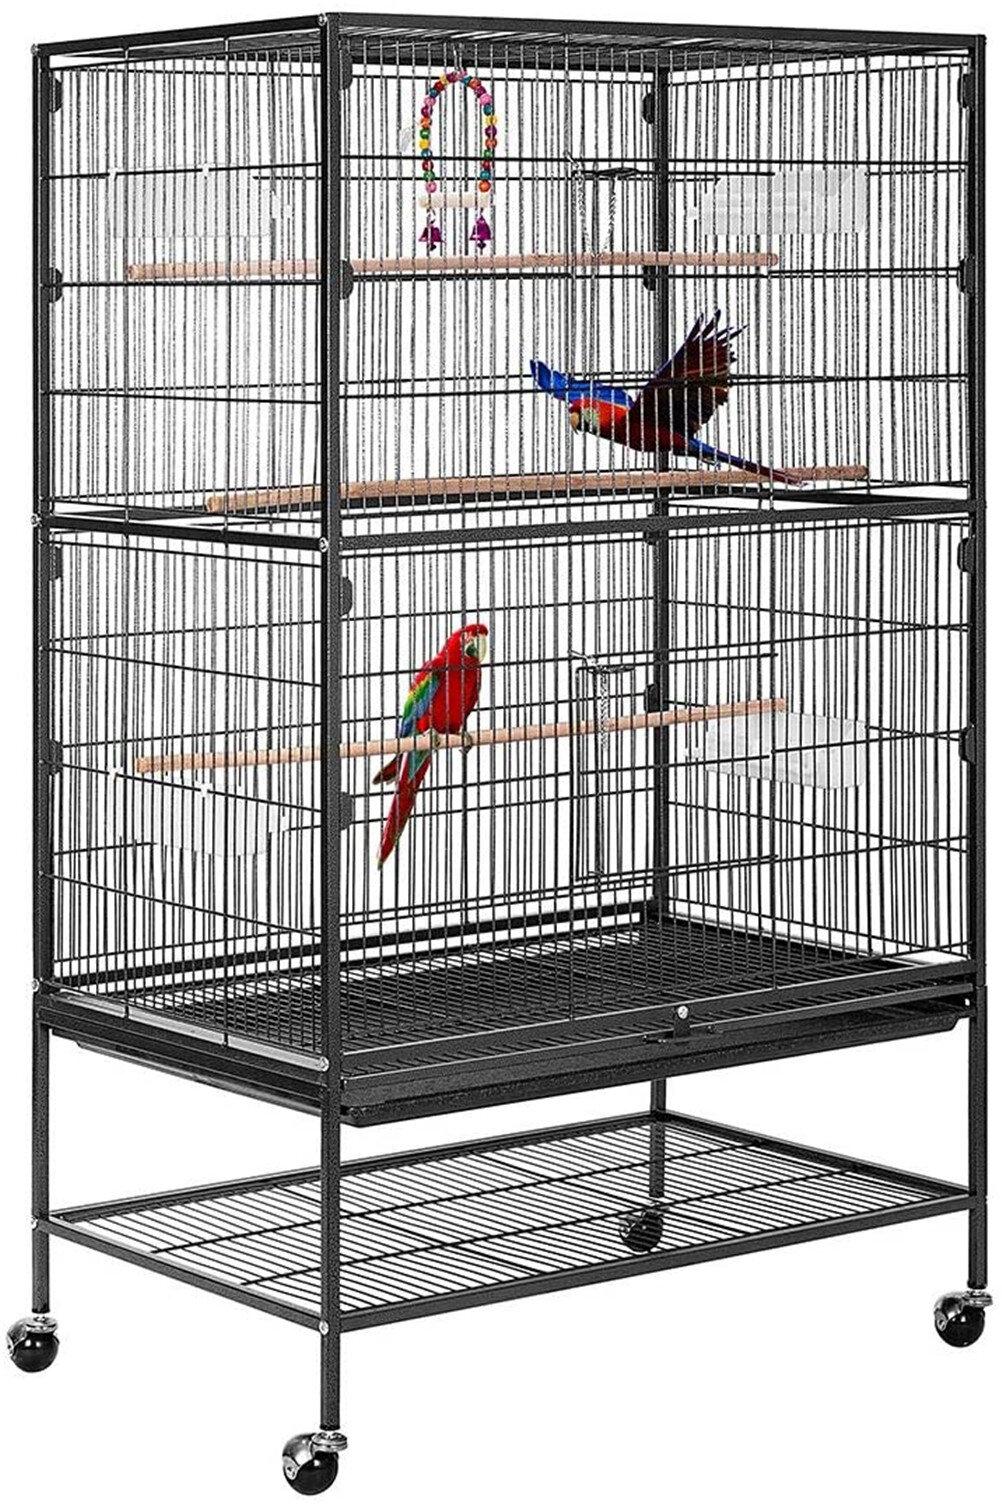 Parakeet Small Bird Less Than 5 8 Bar Spacing Bird Cages You Ll Love In 2021 Wayfair